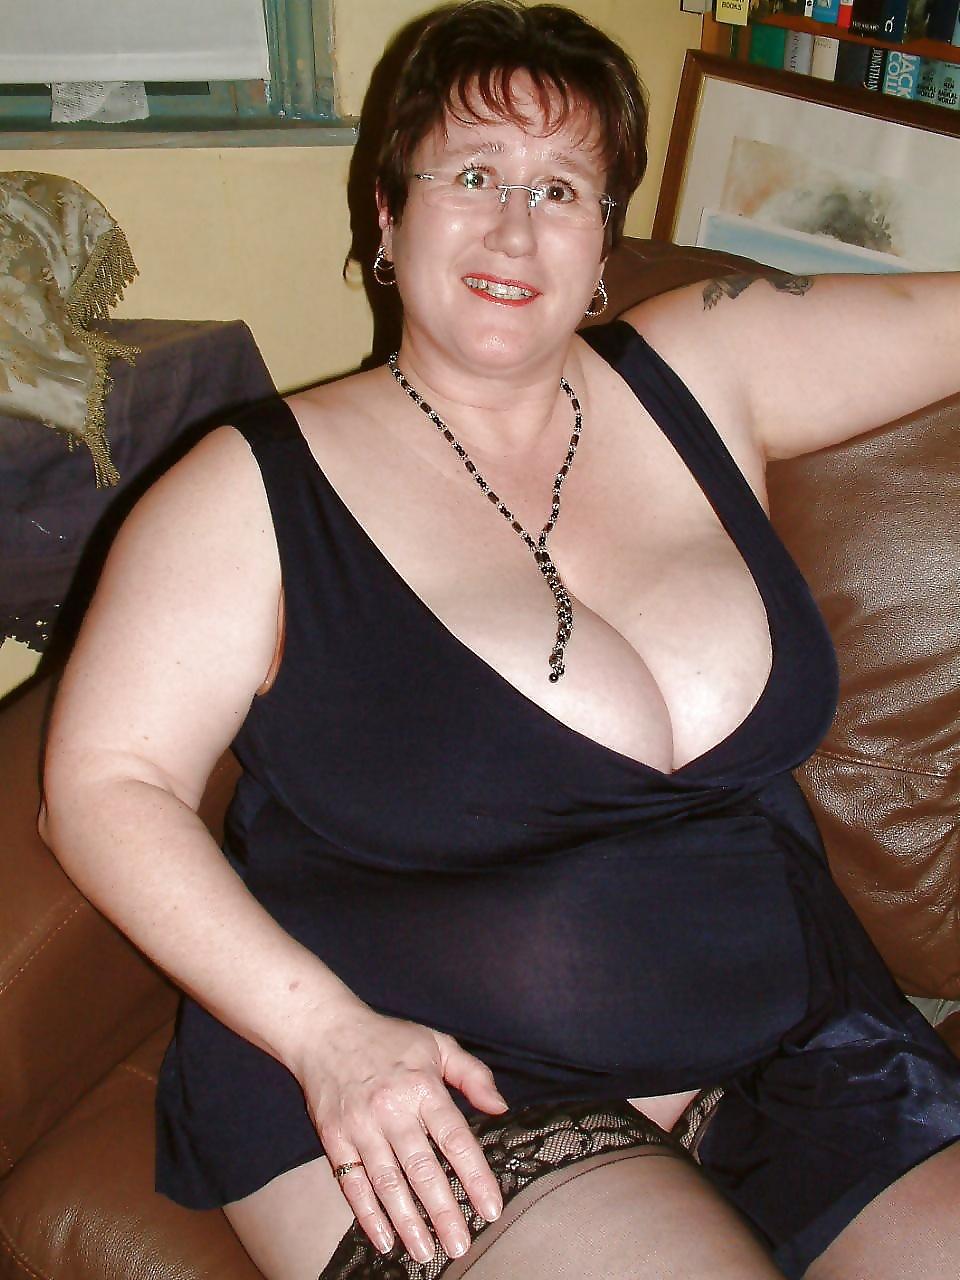 Abuelas Porno Xhans fotos porno de abuelas – porno bizarro, sexo extremo, videos